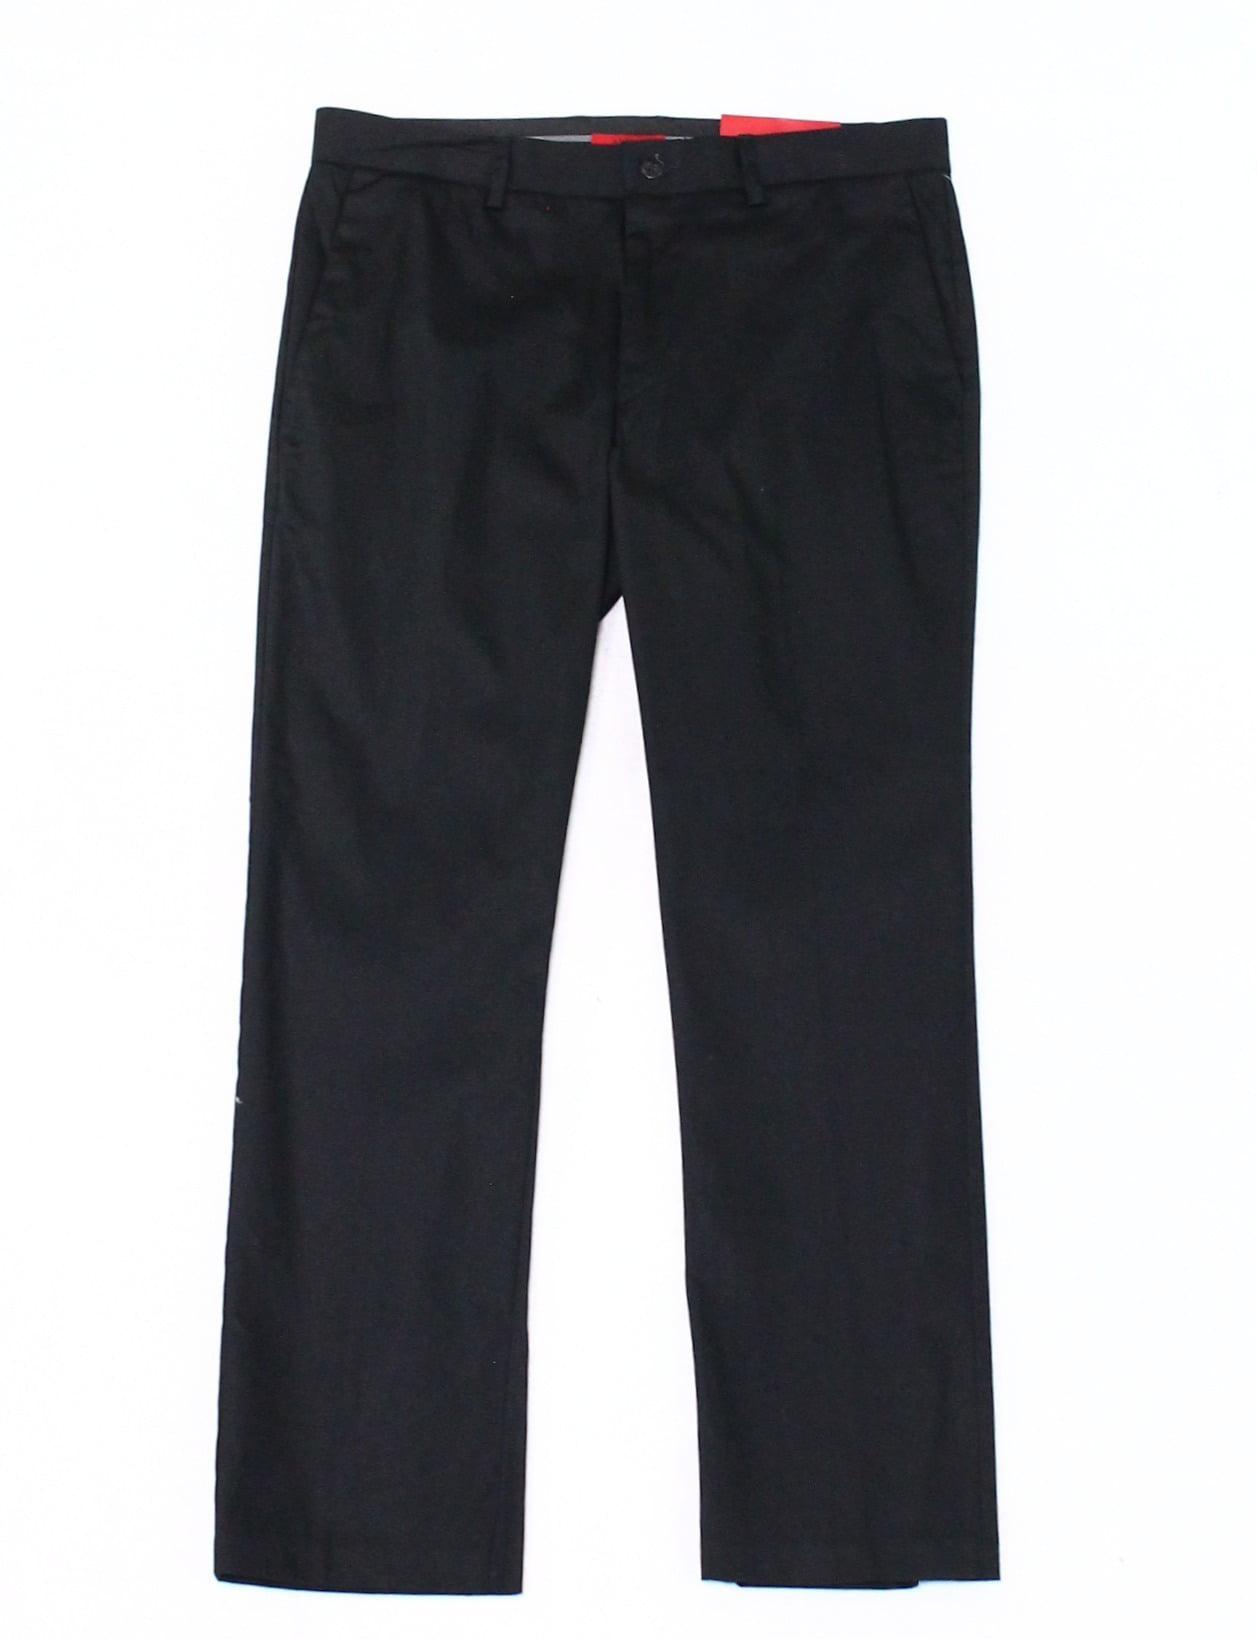 Alfani NEW Black Mens Size 34x29 Stretch Sateen Flat-Front Dress Pants